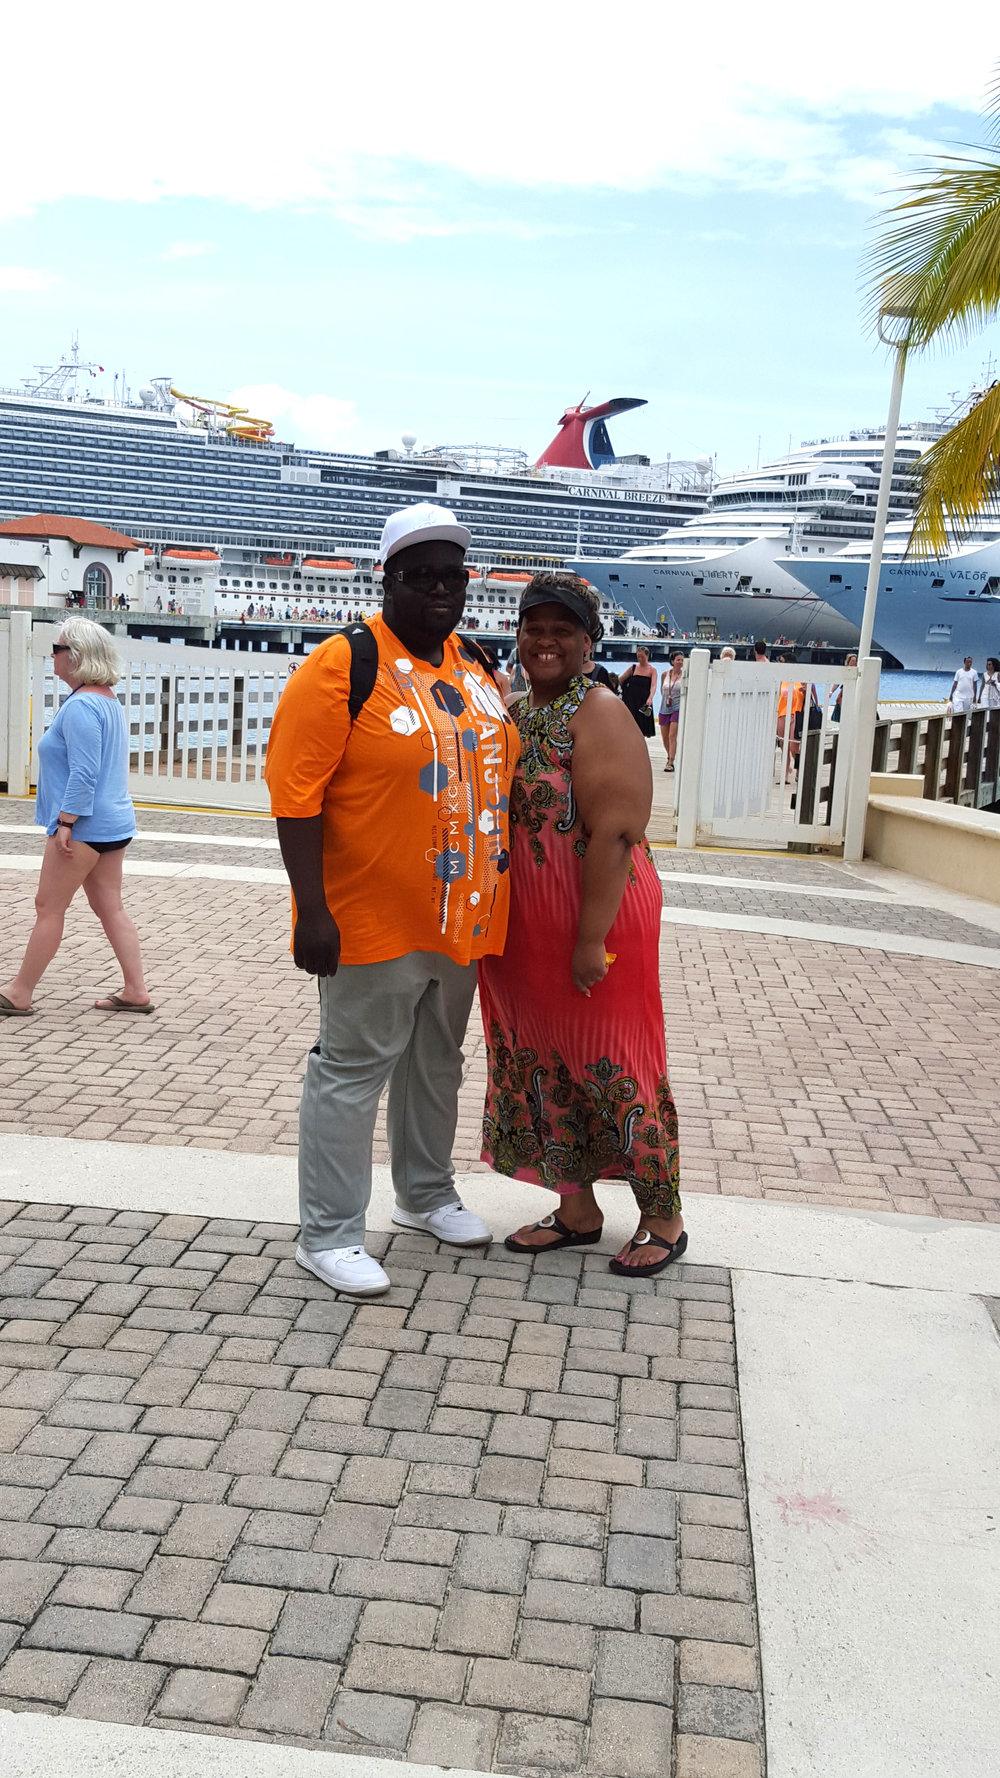 Enjoying a cruise to Cozumel, Mexico